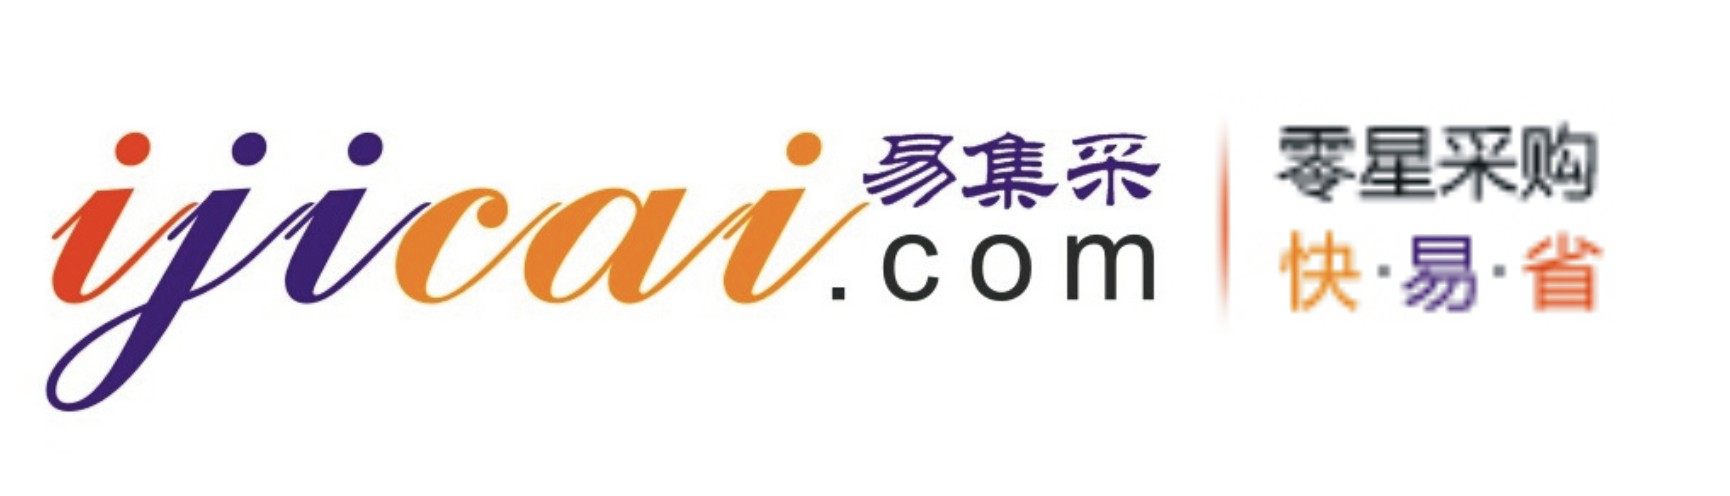 site_logo2 (2).jpg